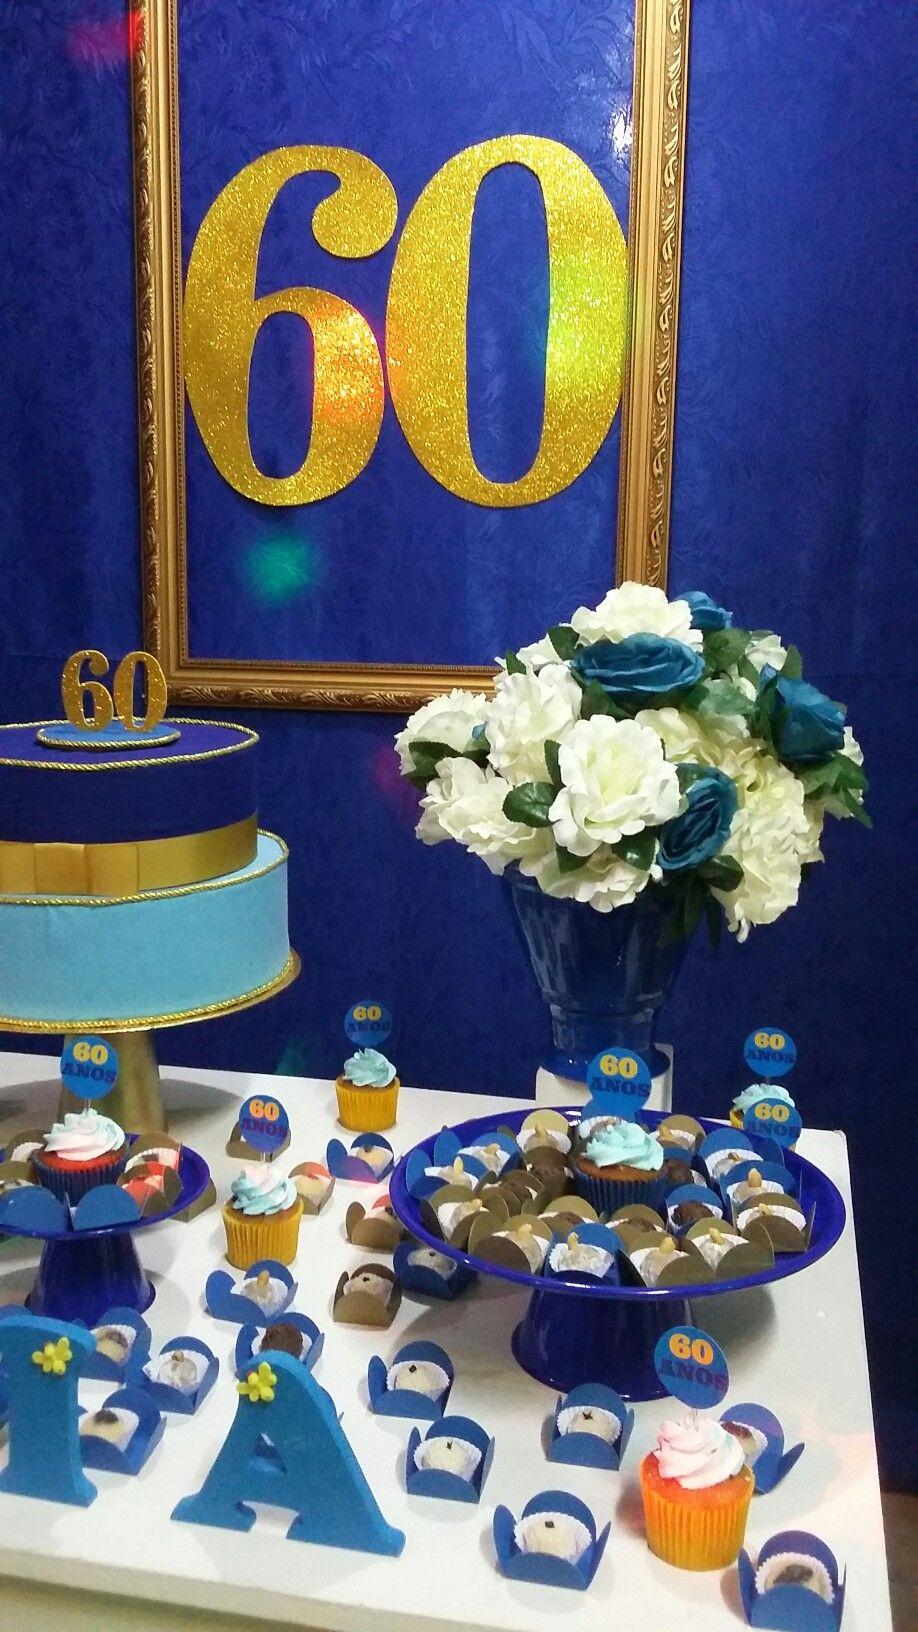 Aniversário de 60 anos,nas cores,azul,branco e dourado.